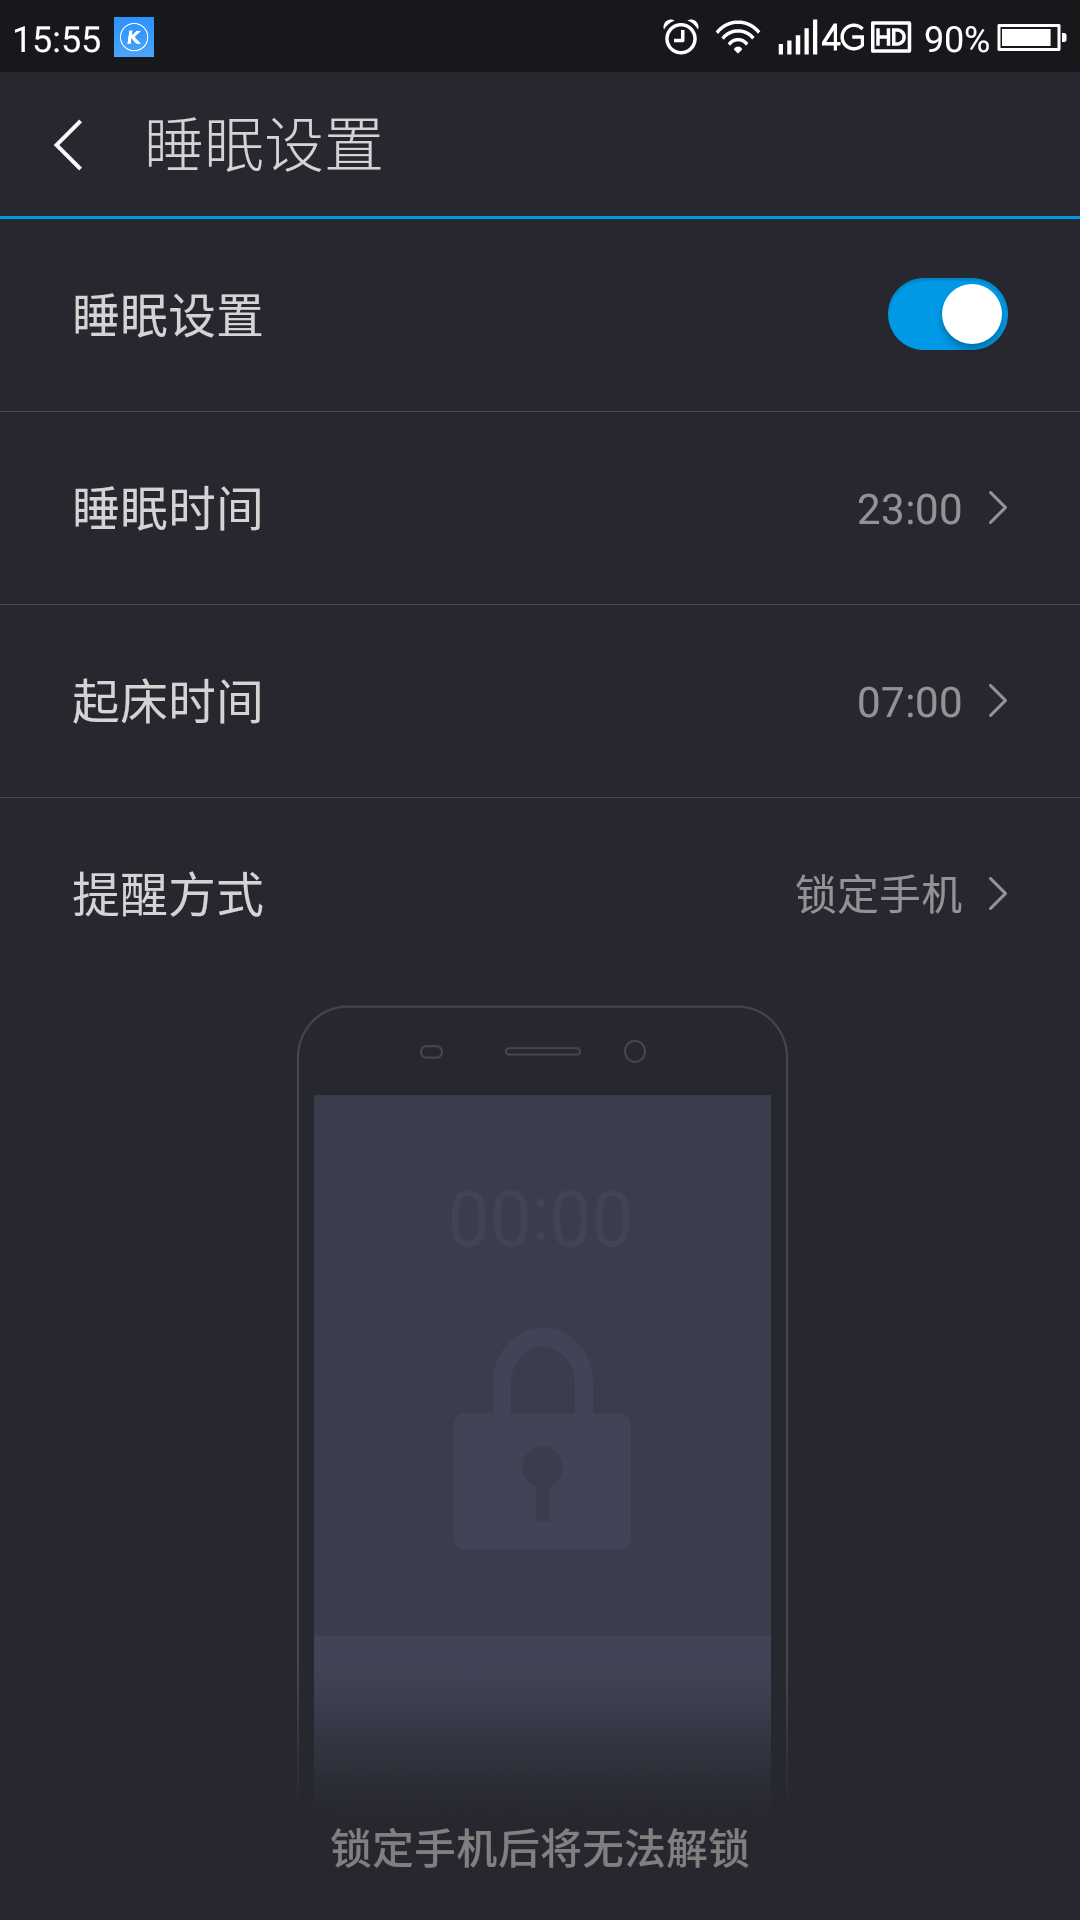 Screenshot_2018-01-15-15-55-02.png